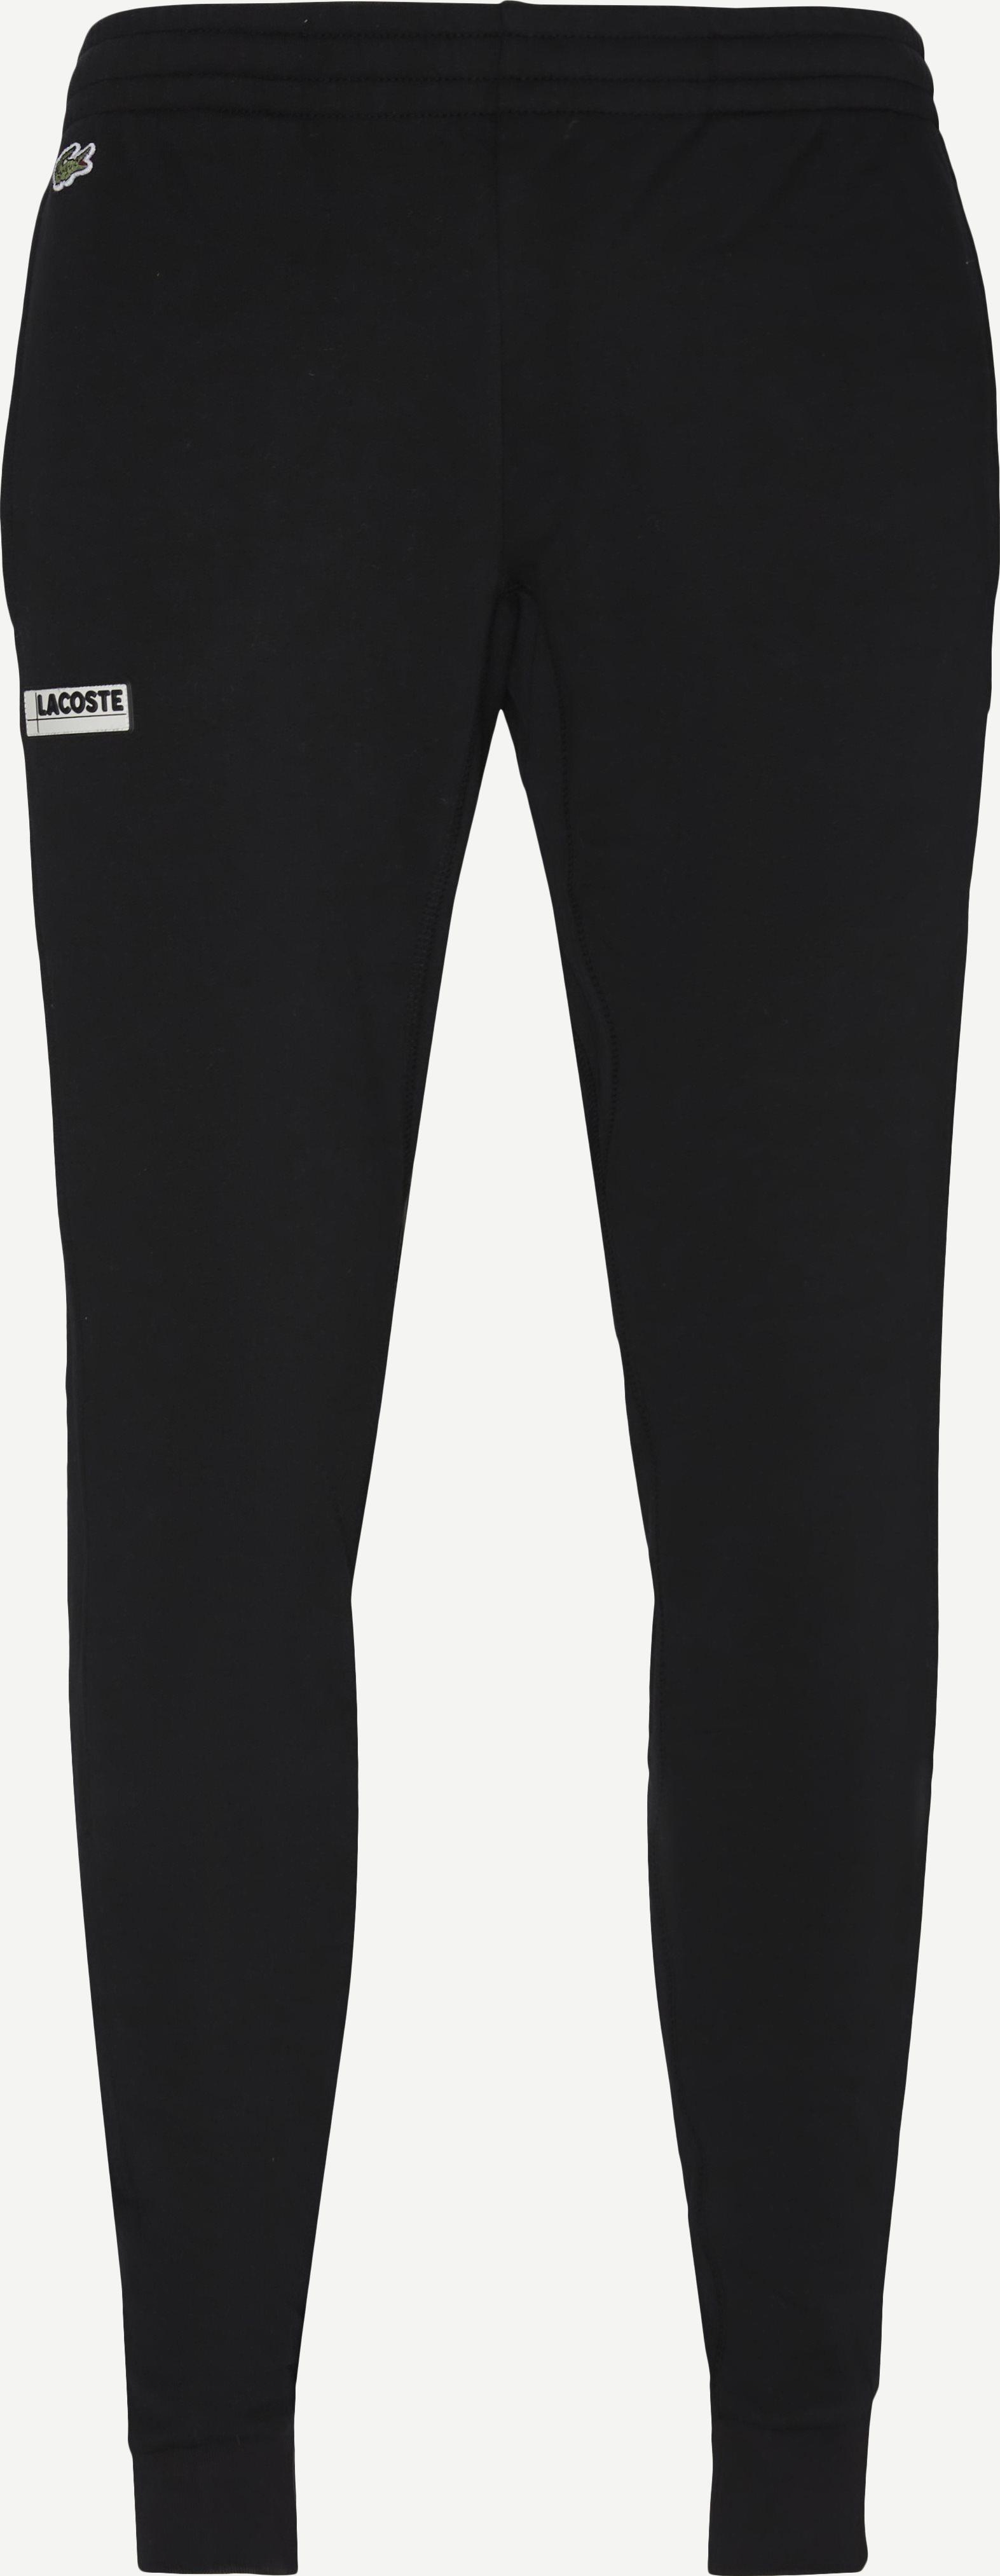 Badge Fleece Jogging Pants - Trousers - Regular - Black